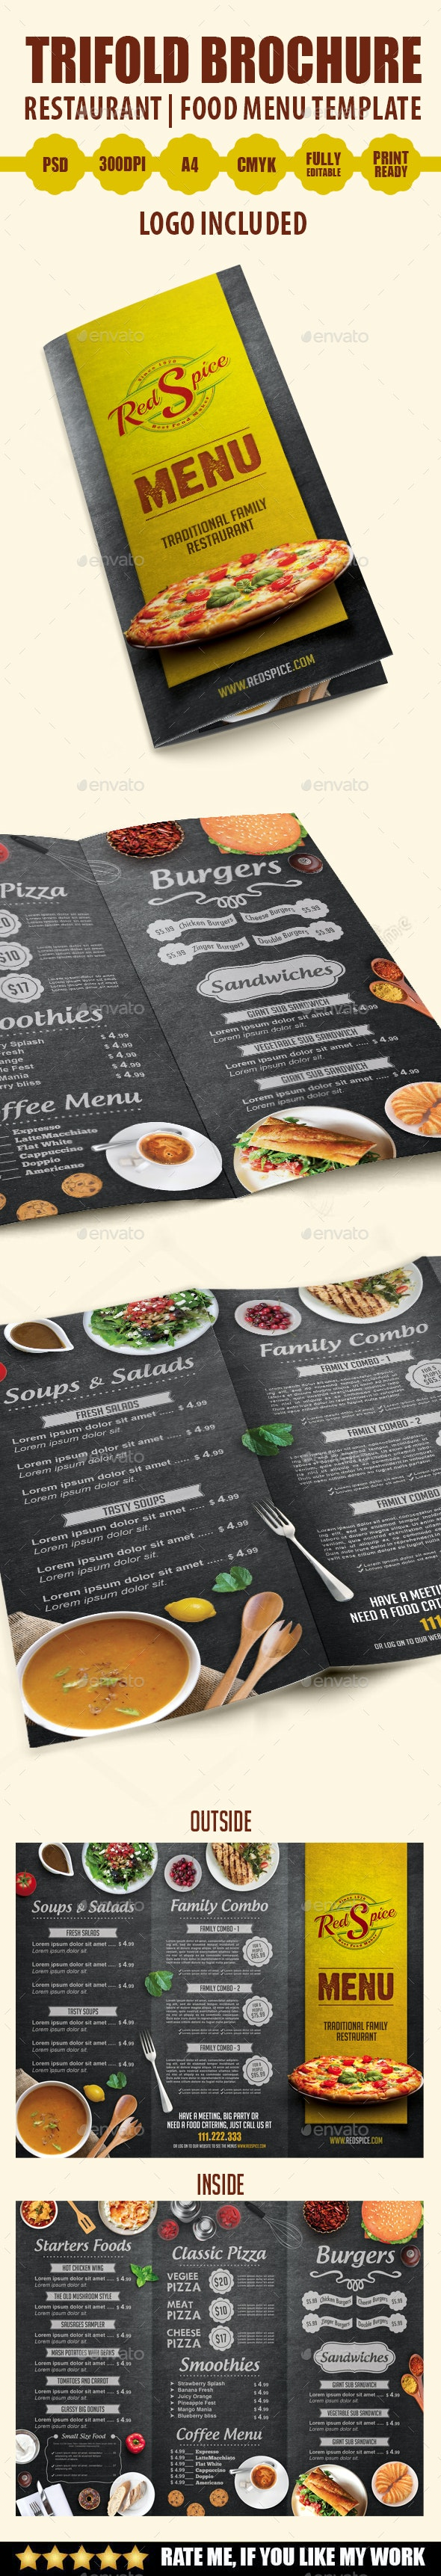 Trifold Brochure Restaurant Menu Template - Food Menus Print Templates